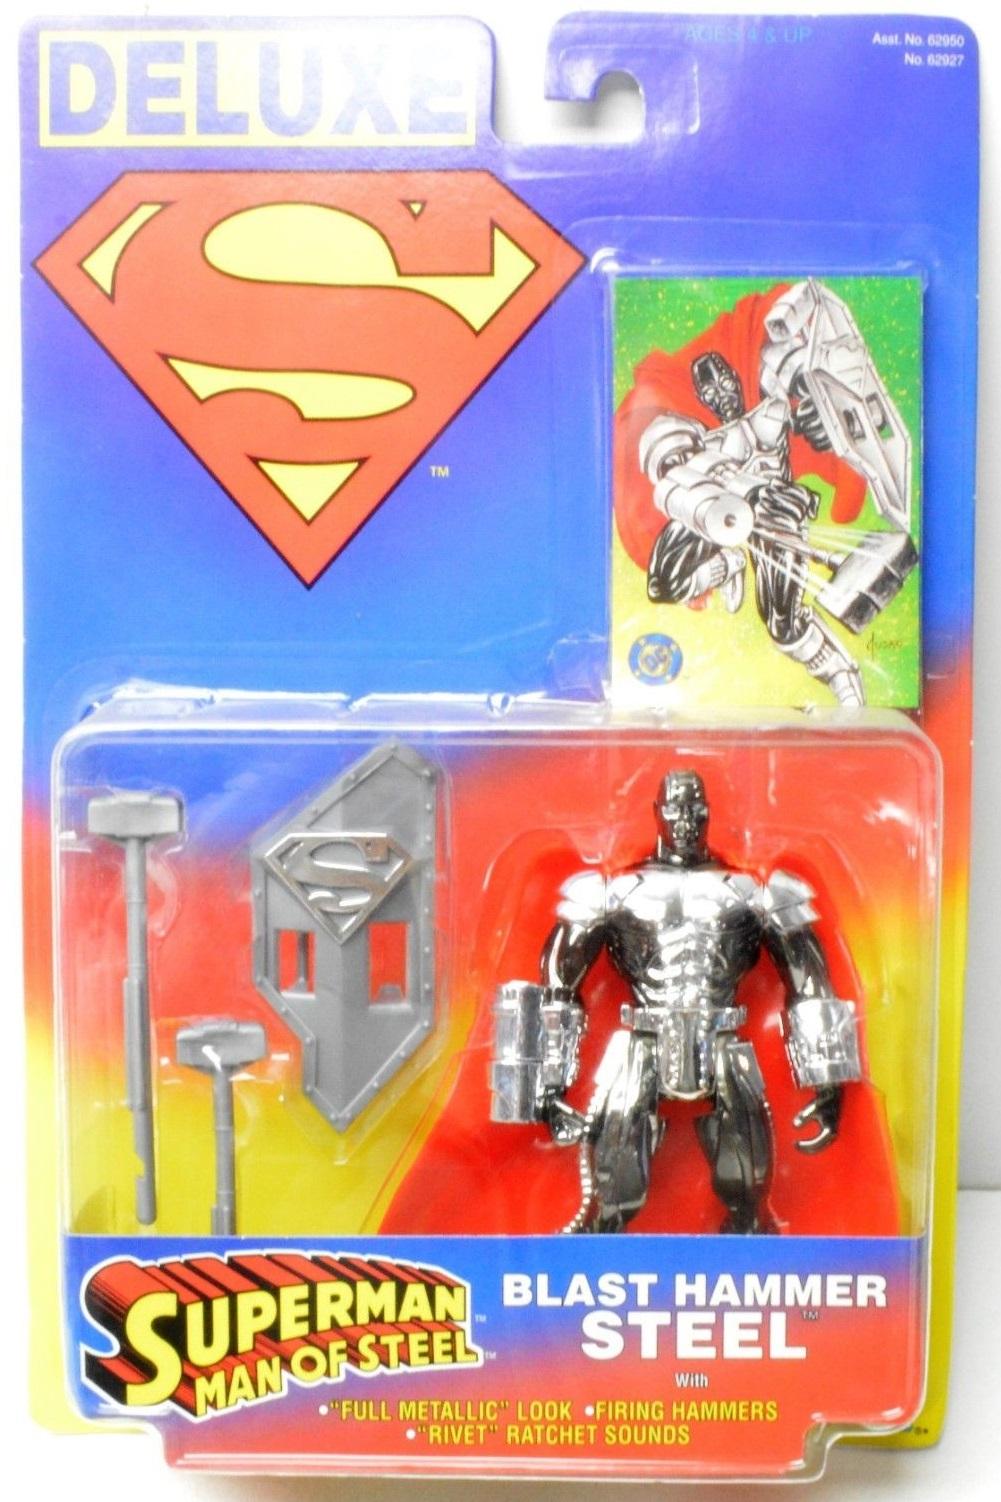 Blast Hammer Steel